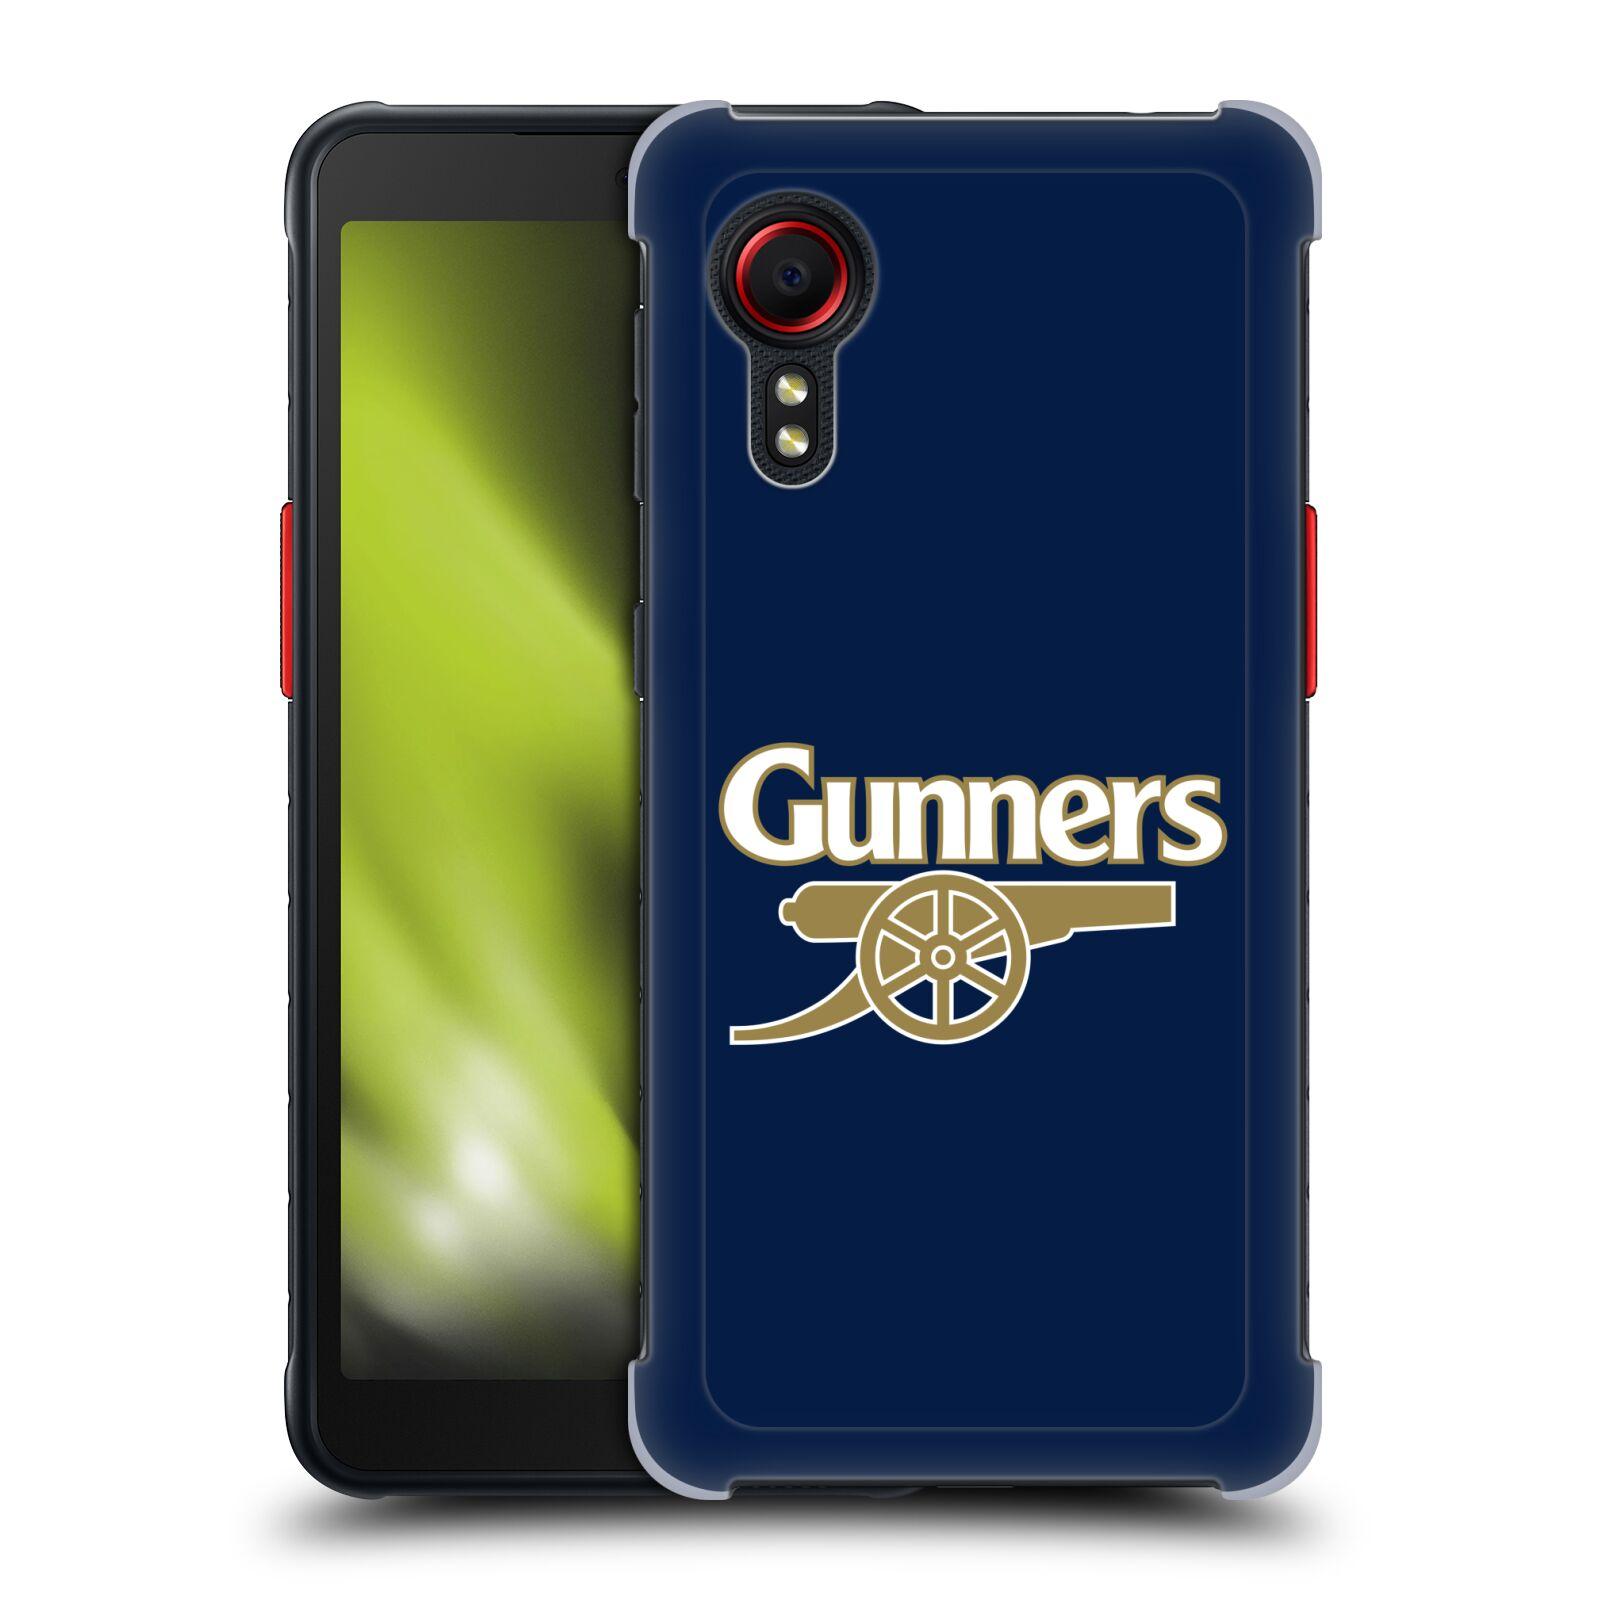 Plastové pouzdro na mobil Samsung Galaxy Xcover 5 - Head Case - Arsenal FC - Gunners